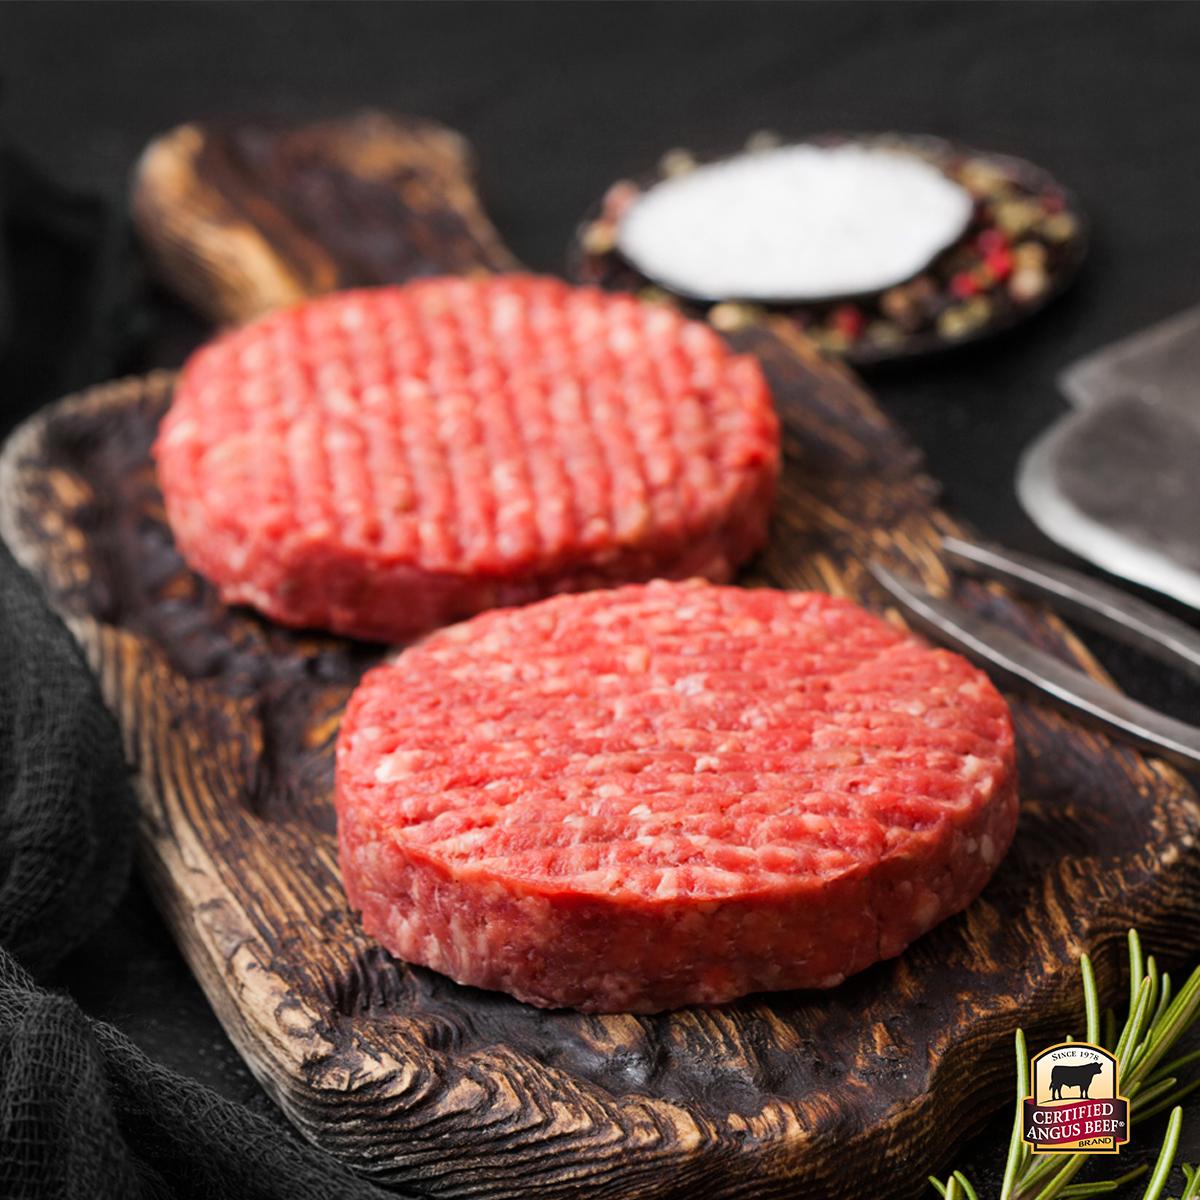 Hamburguesas 8 oz Certified Angus Beef®